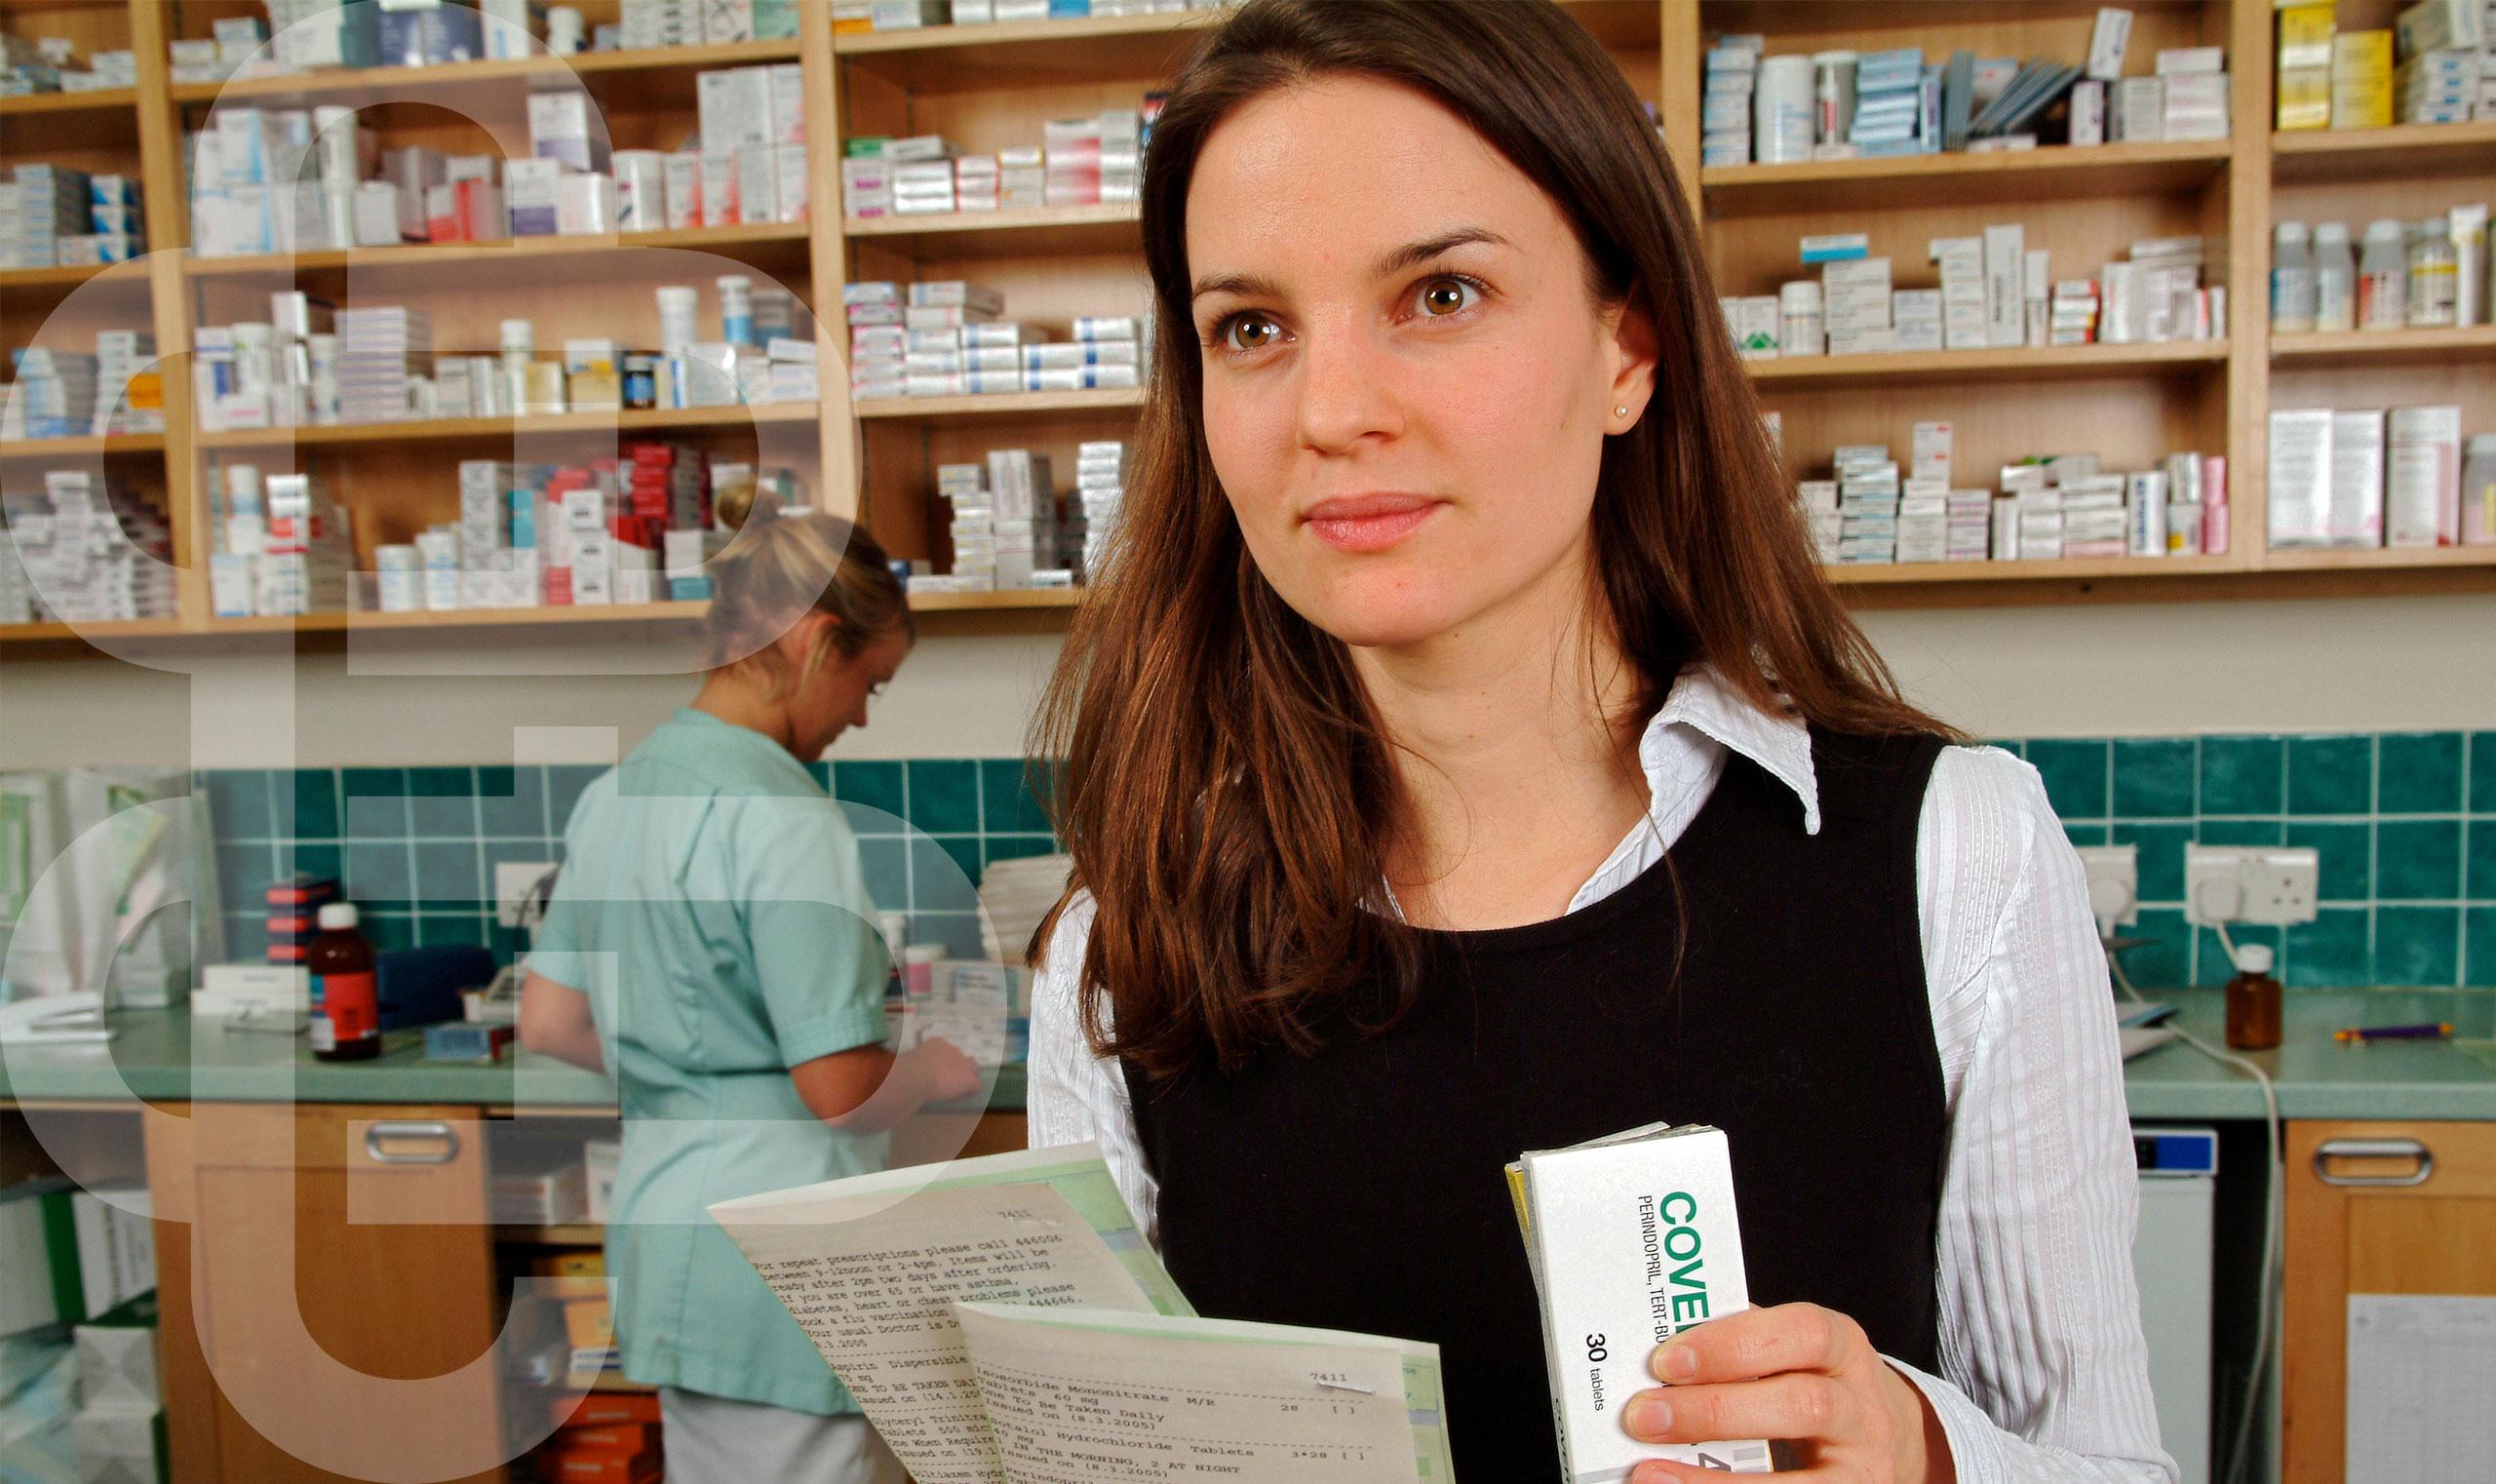 Pharmacist giving advice